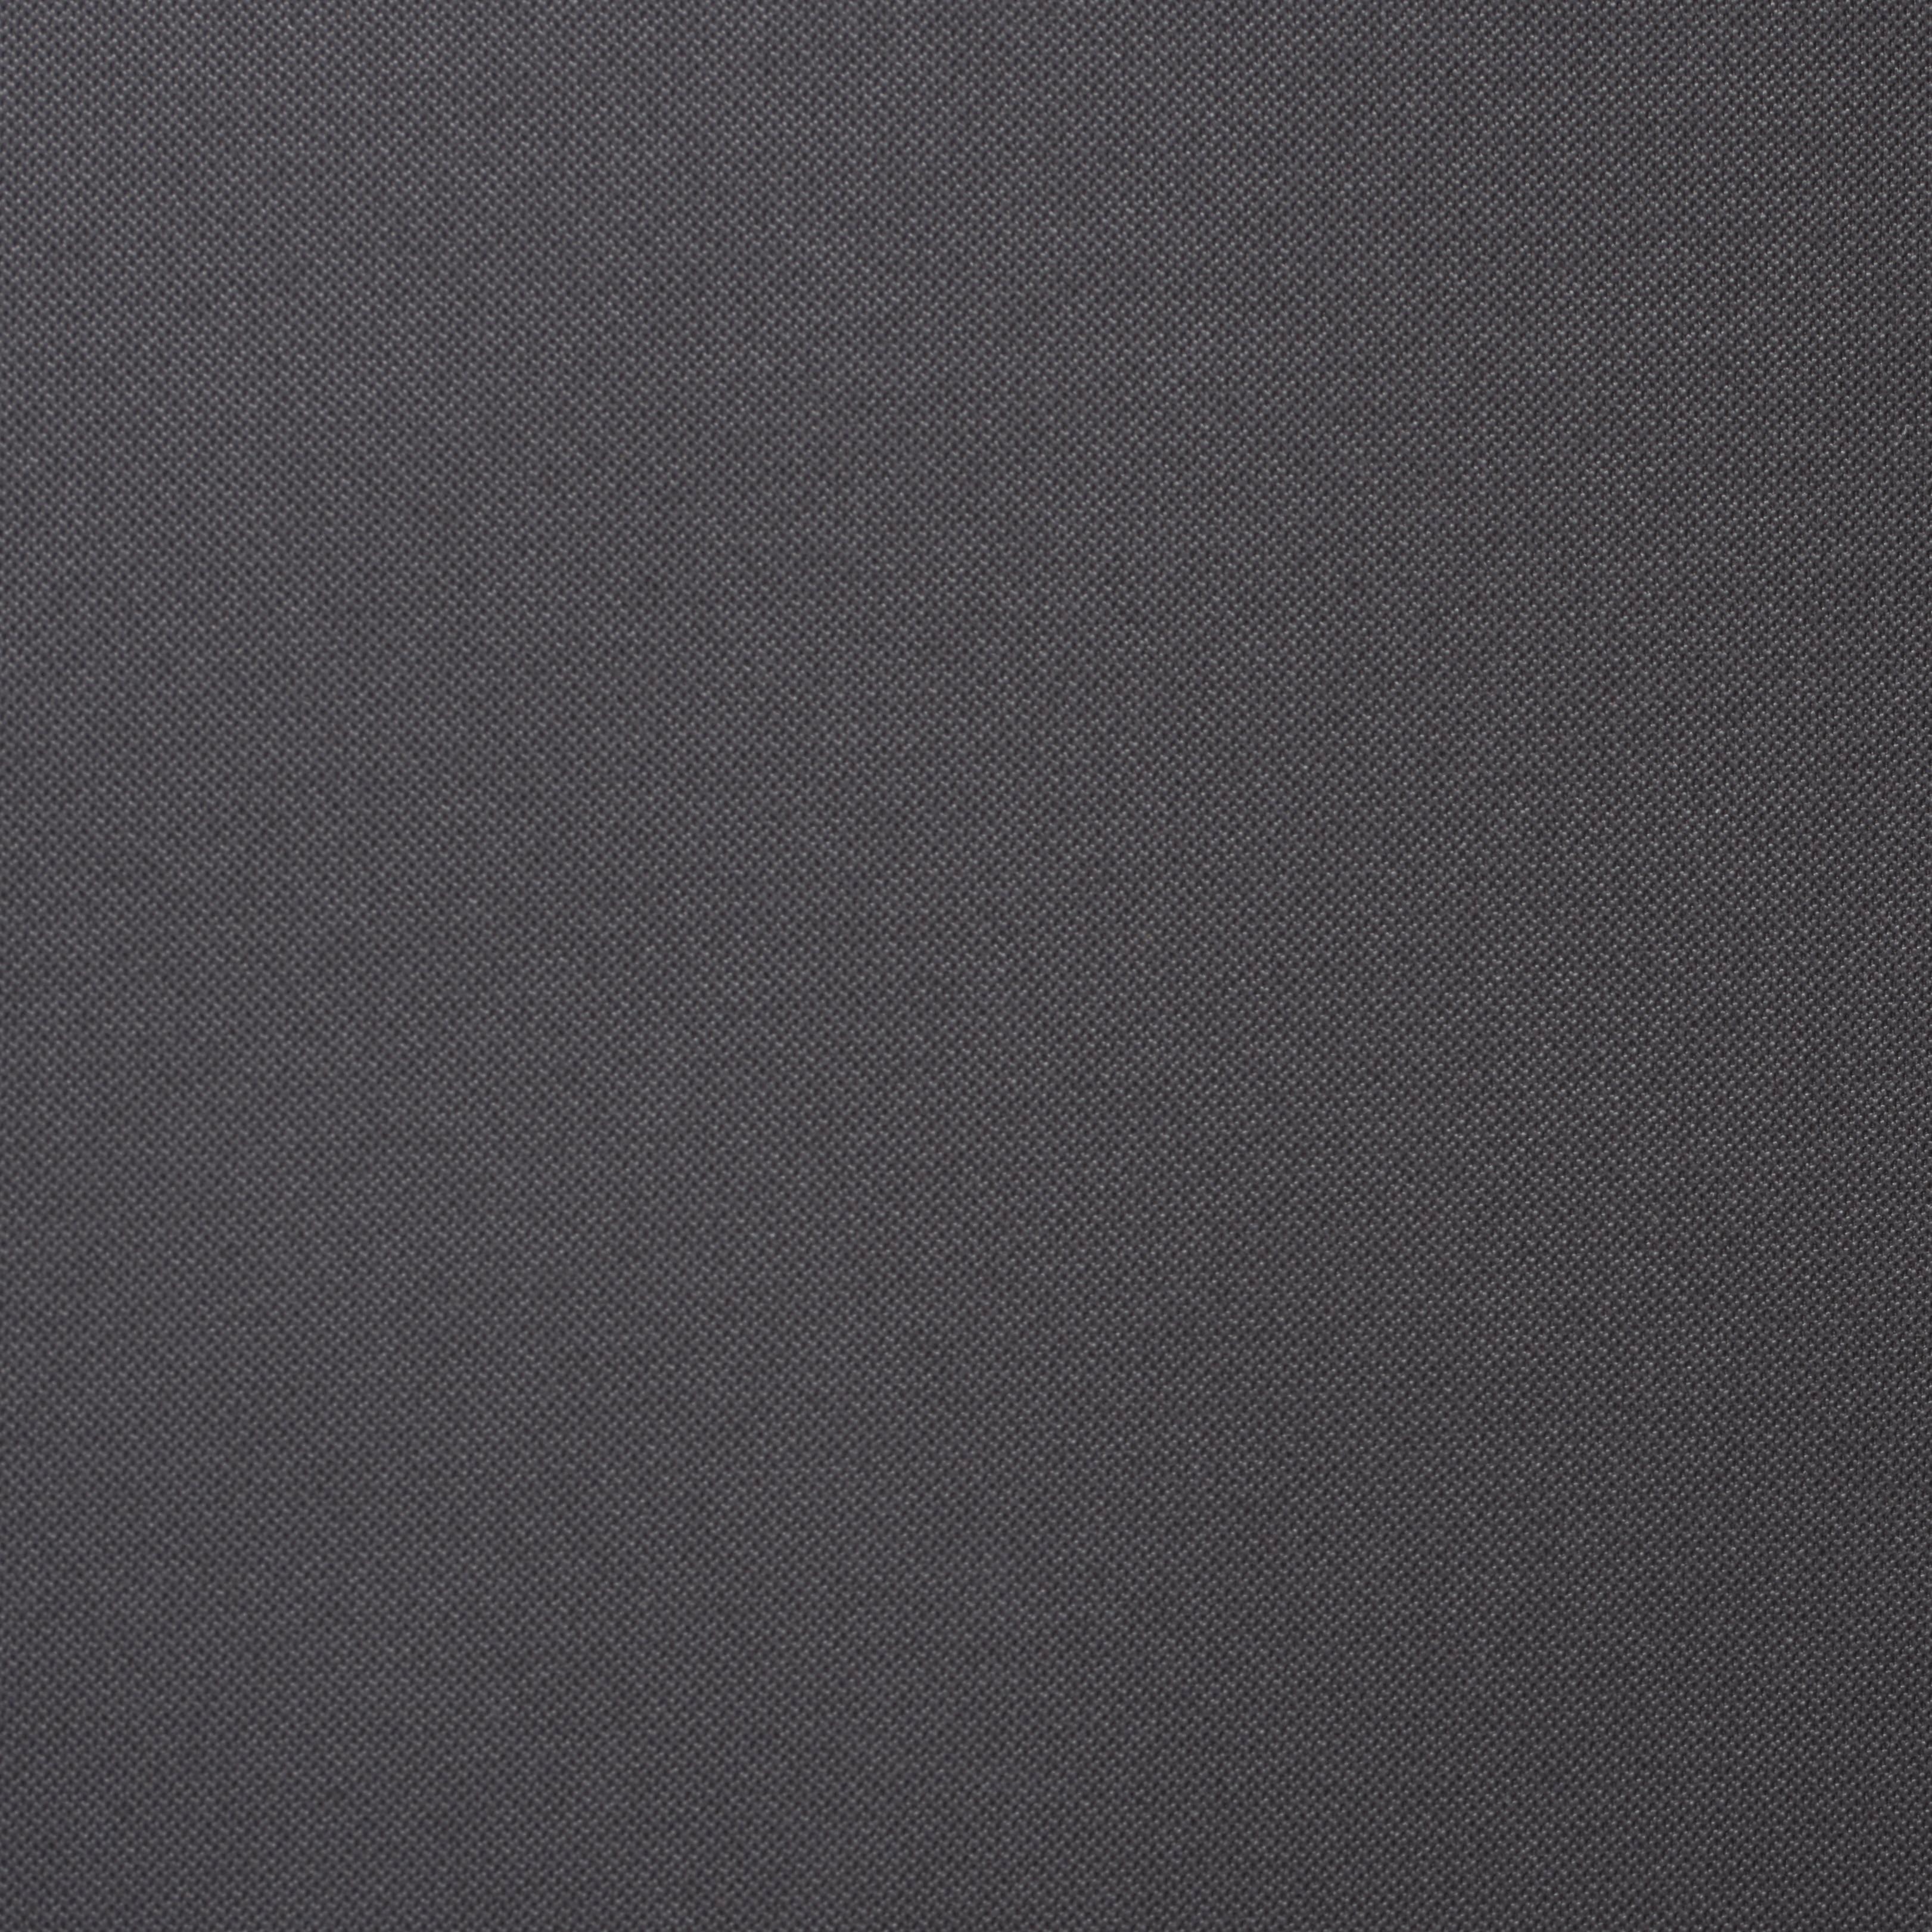 Fernsehsessel Fox inkl. Kissen - Wengefarben/Grau, MODERN, Holz/Textil (120/98/138cm) - MÖMAX modern living